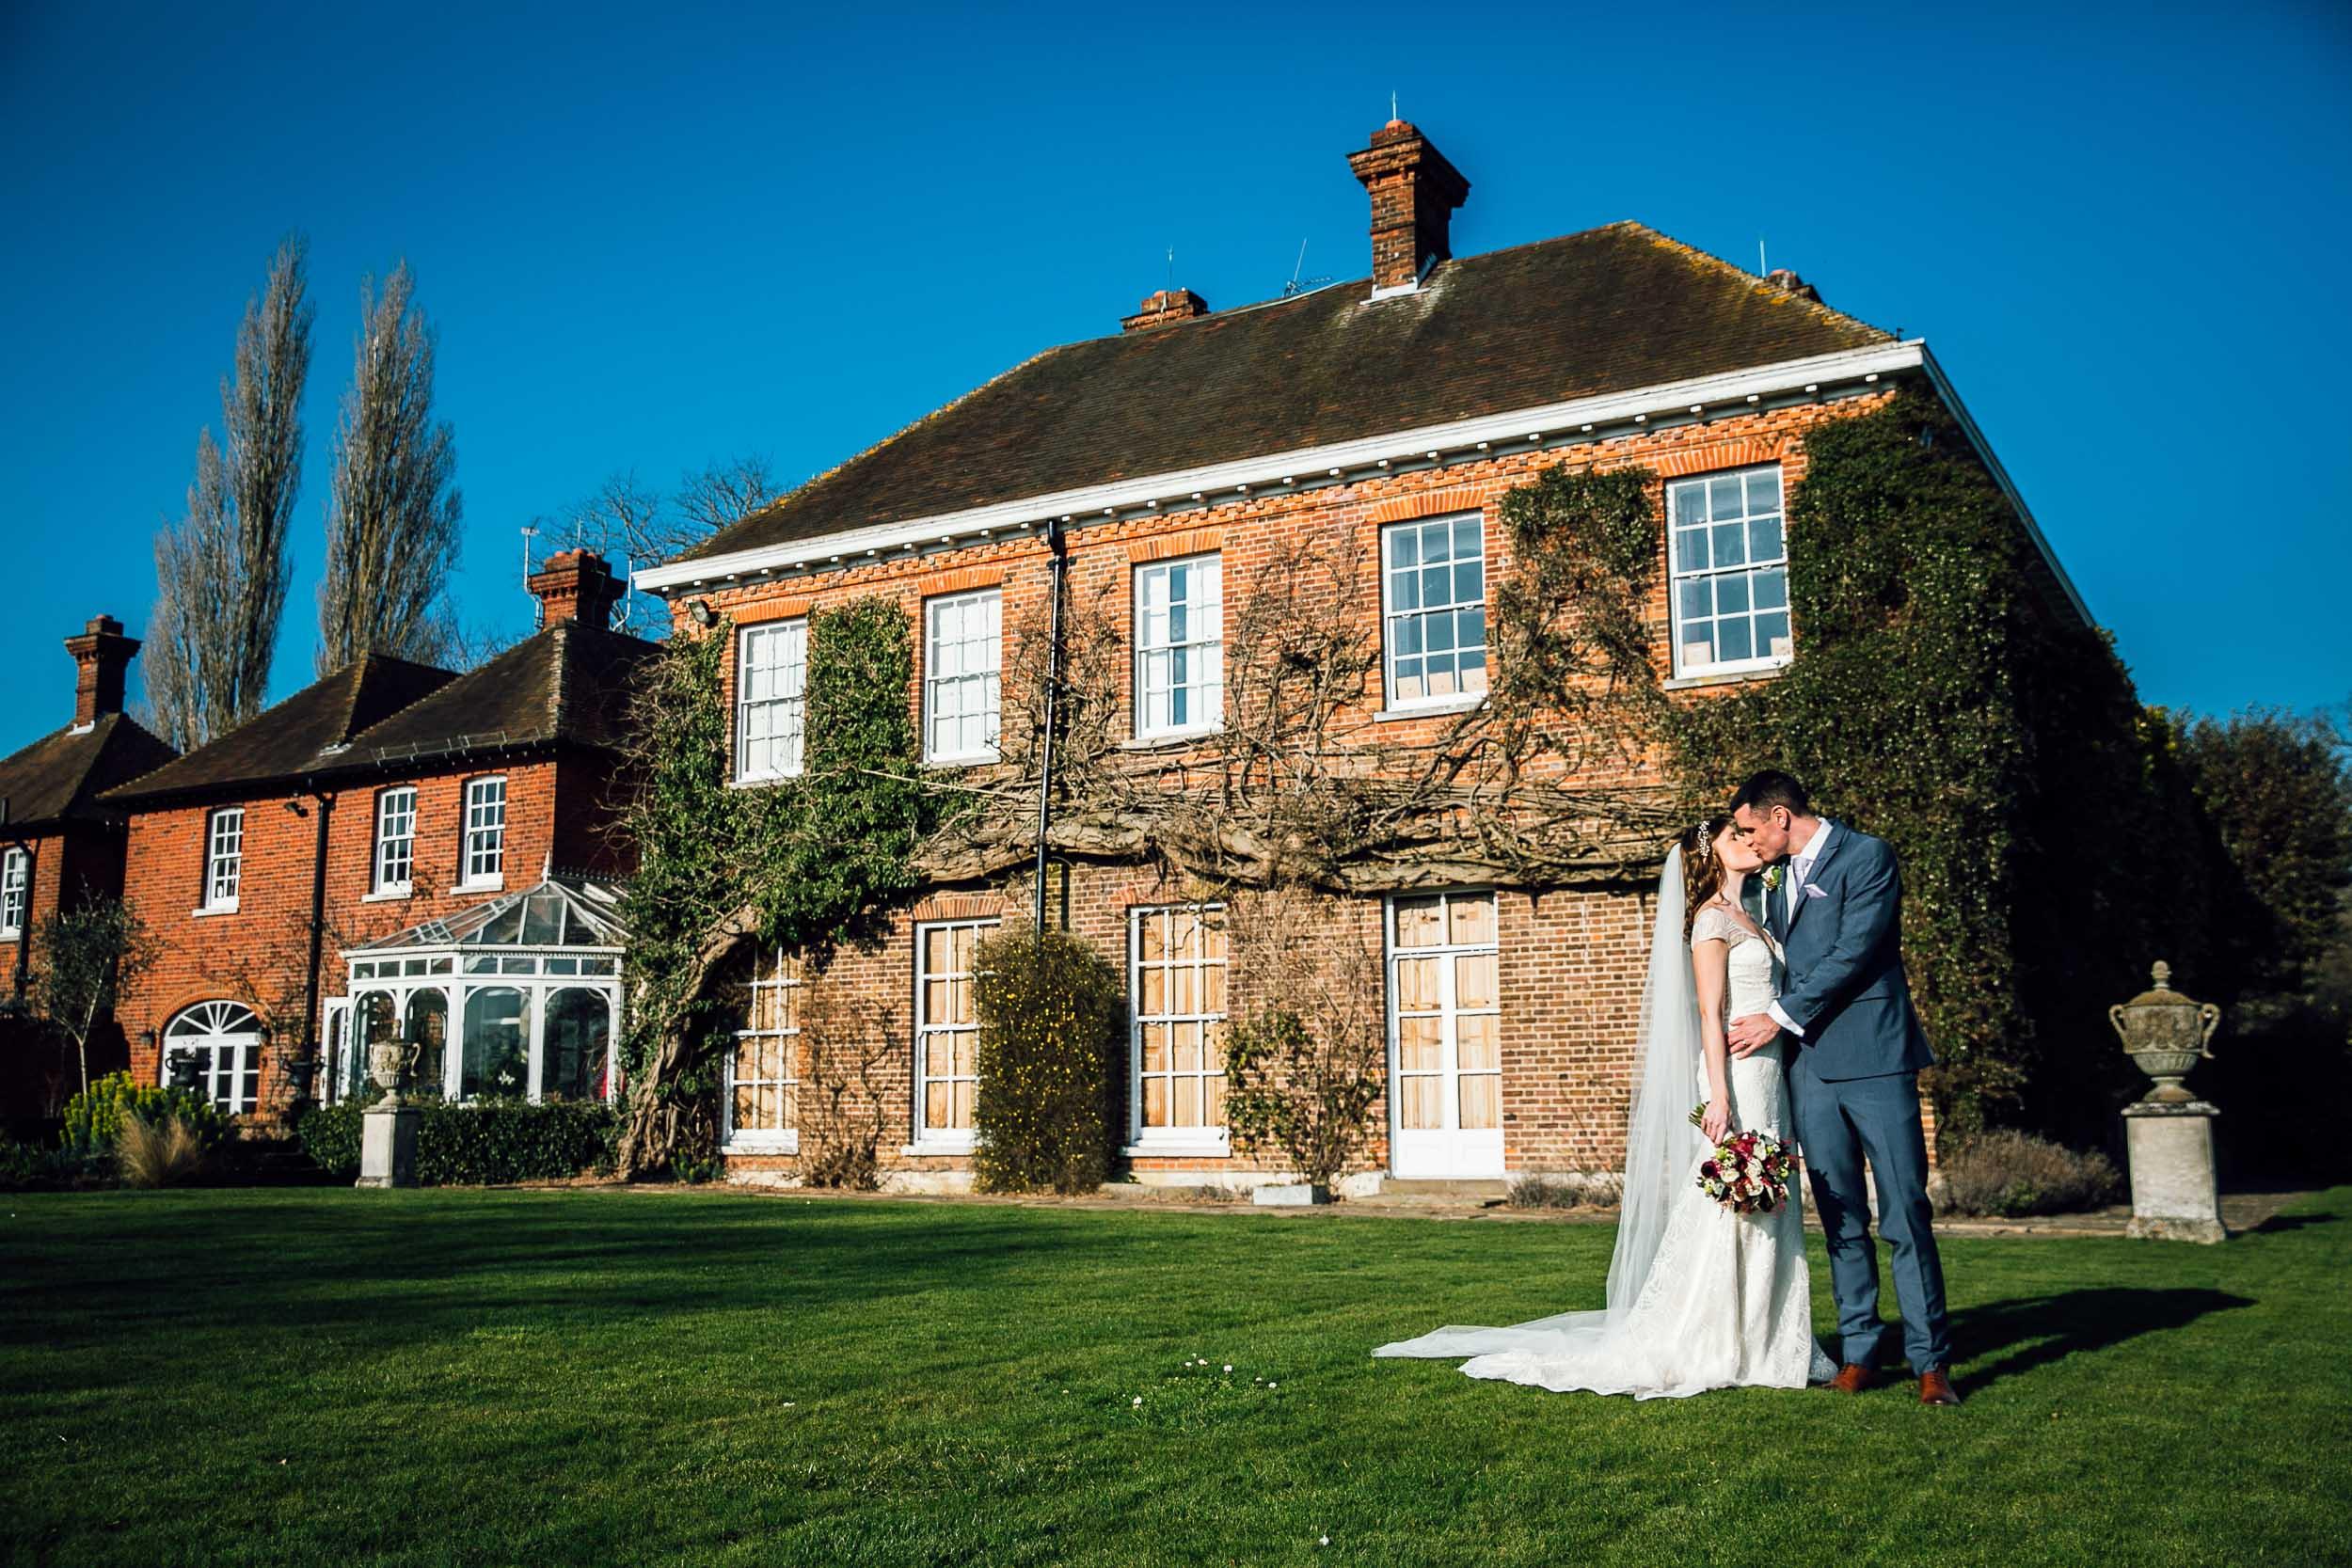 micklefield-hall-wedding-photographer 044.jpg